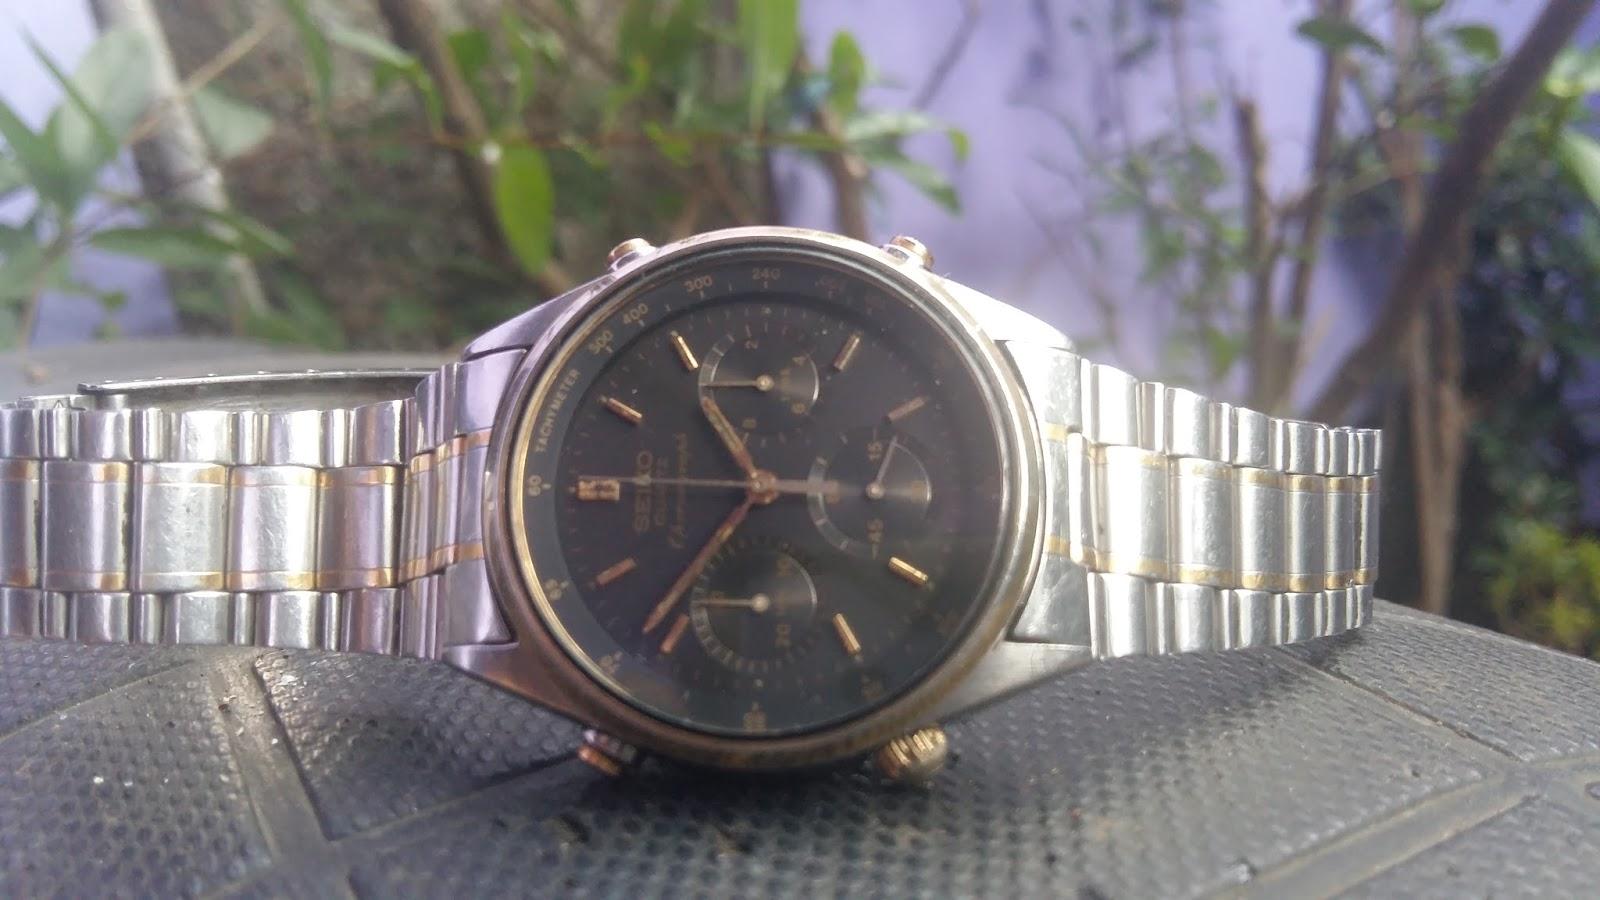 xDeath Market: (SOLD) Seiko Quartz Chronograph ref. 7a28 ...